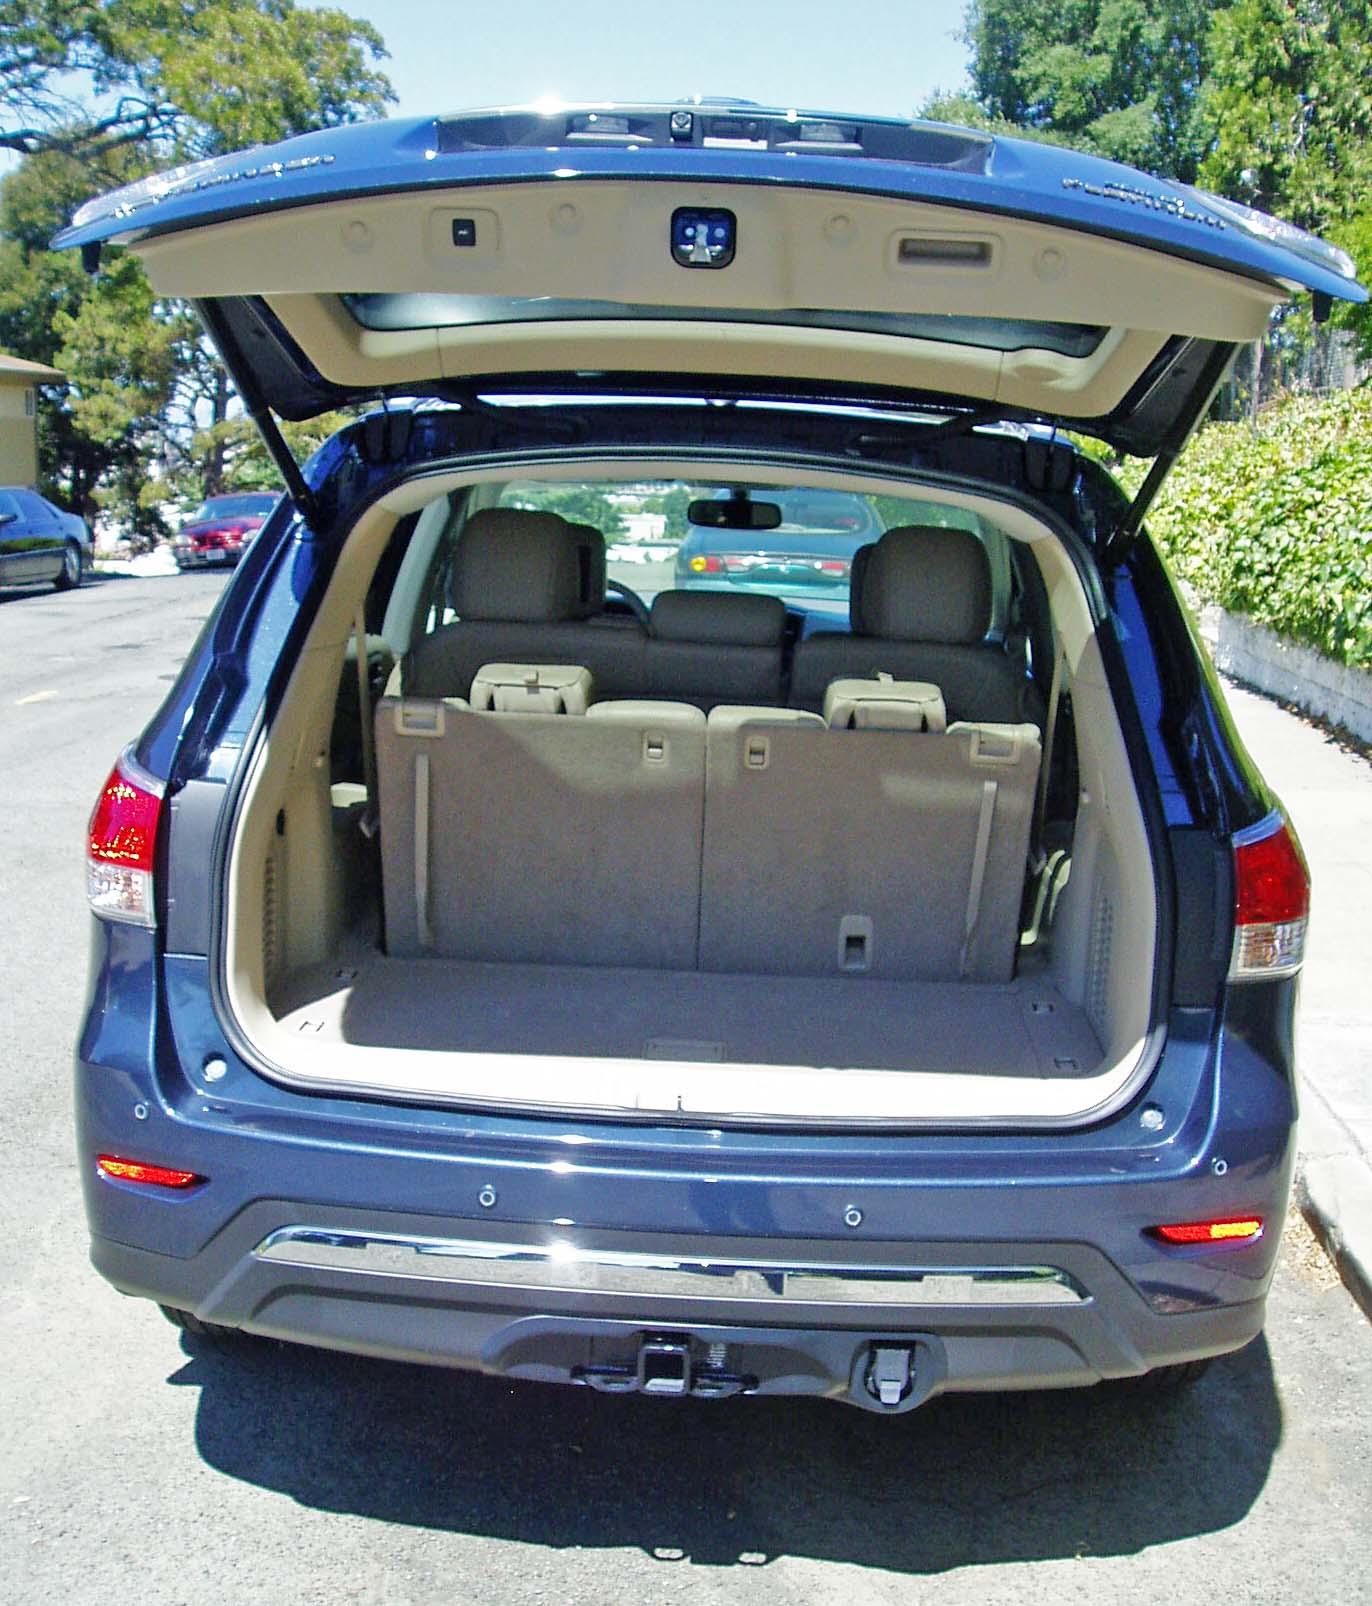 2013 Nissan Pathfinder Platinum 4—4 Test Drive – Our Auto Expert